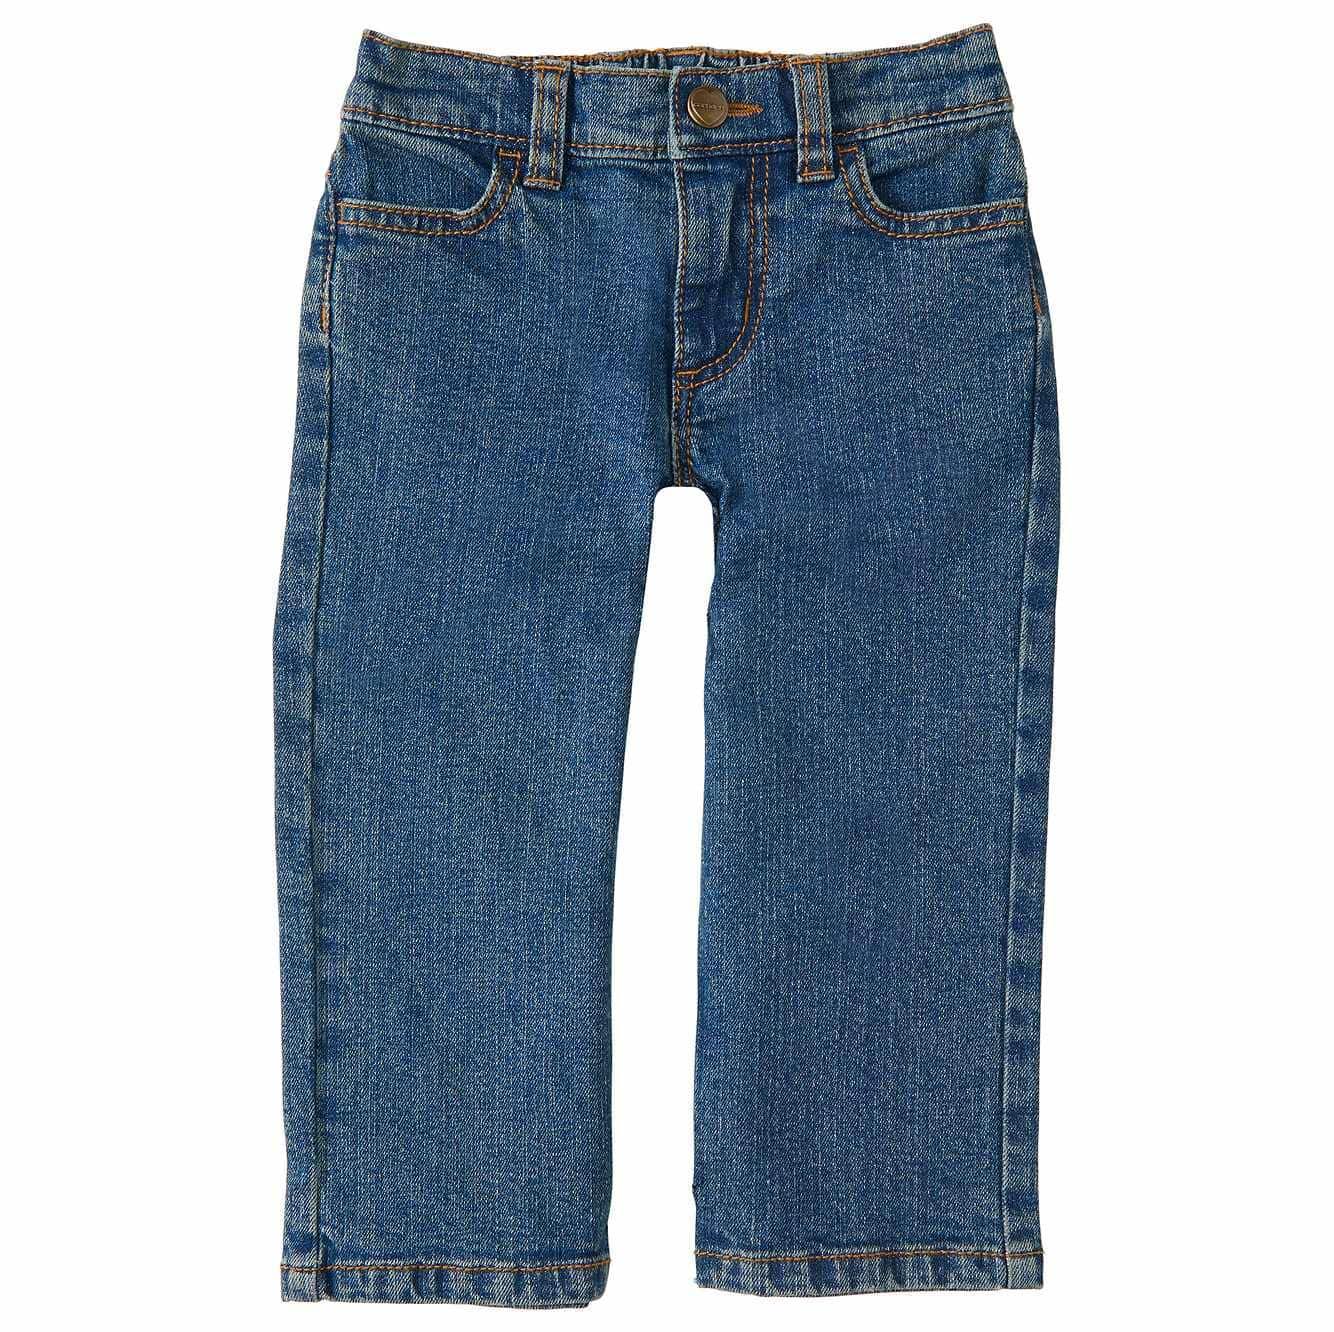 Picture of Denim 5-Pocket Jean in Medium Wash